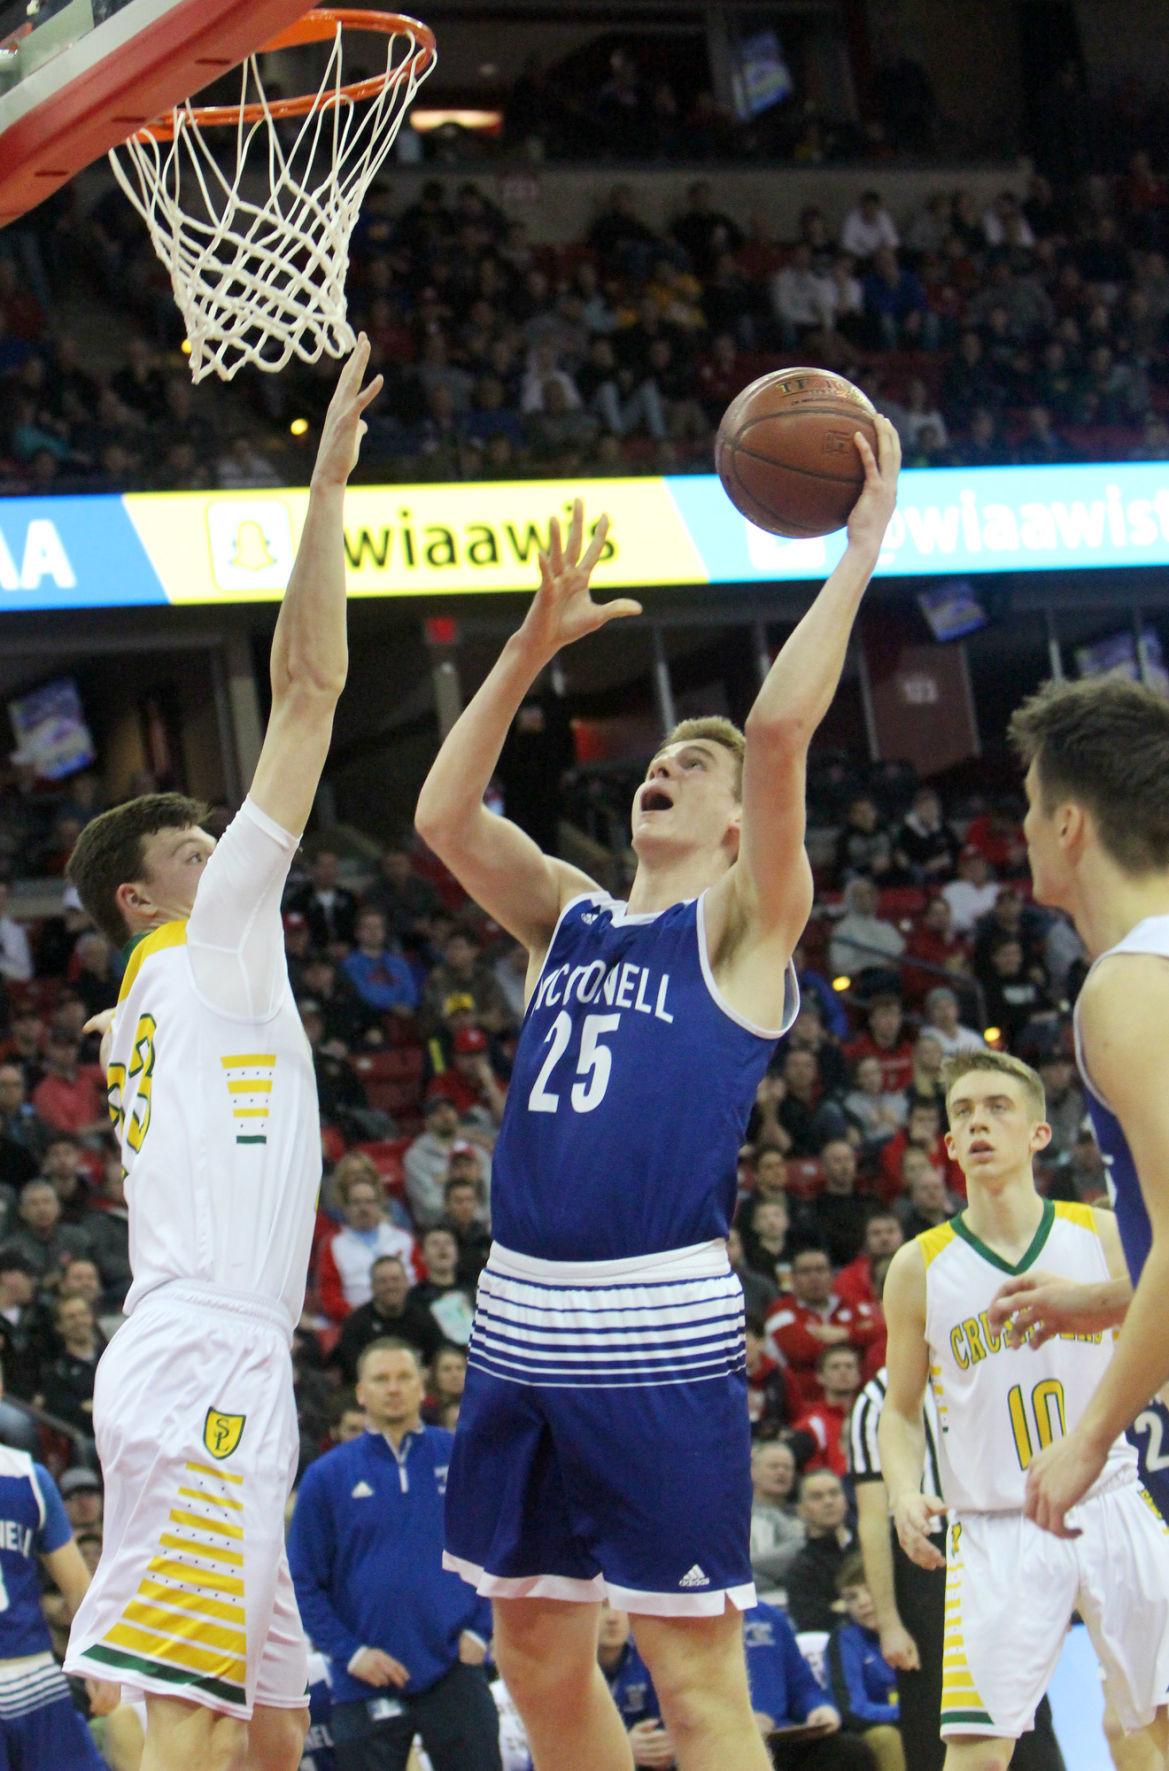 McDonell boys basketball vs Sheboygan Area Lutheran 3-15-19